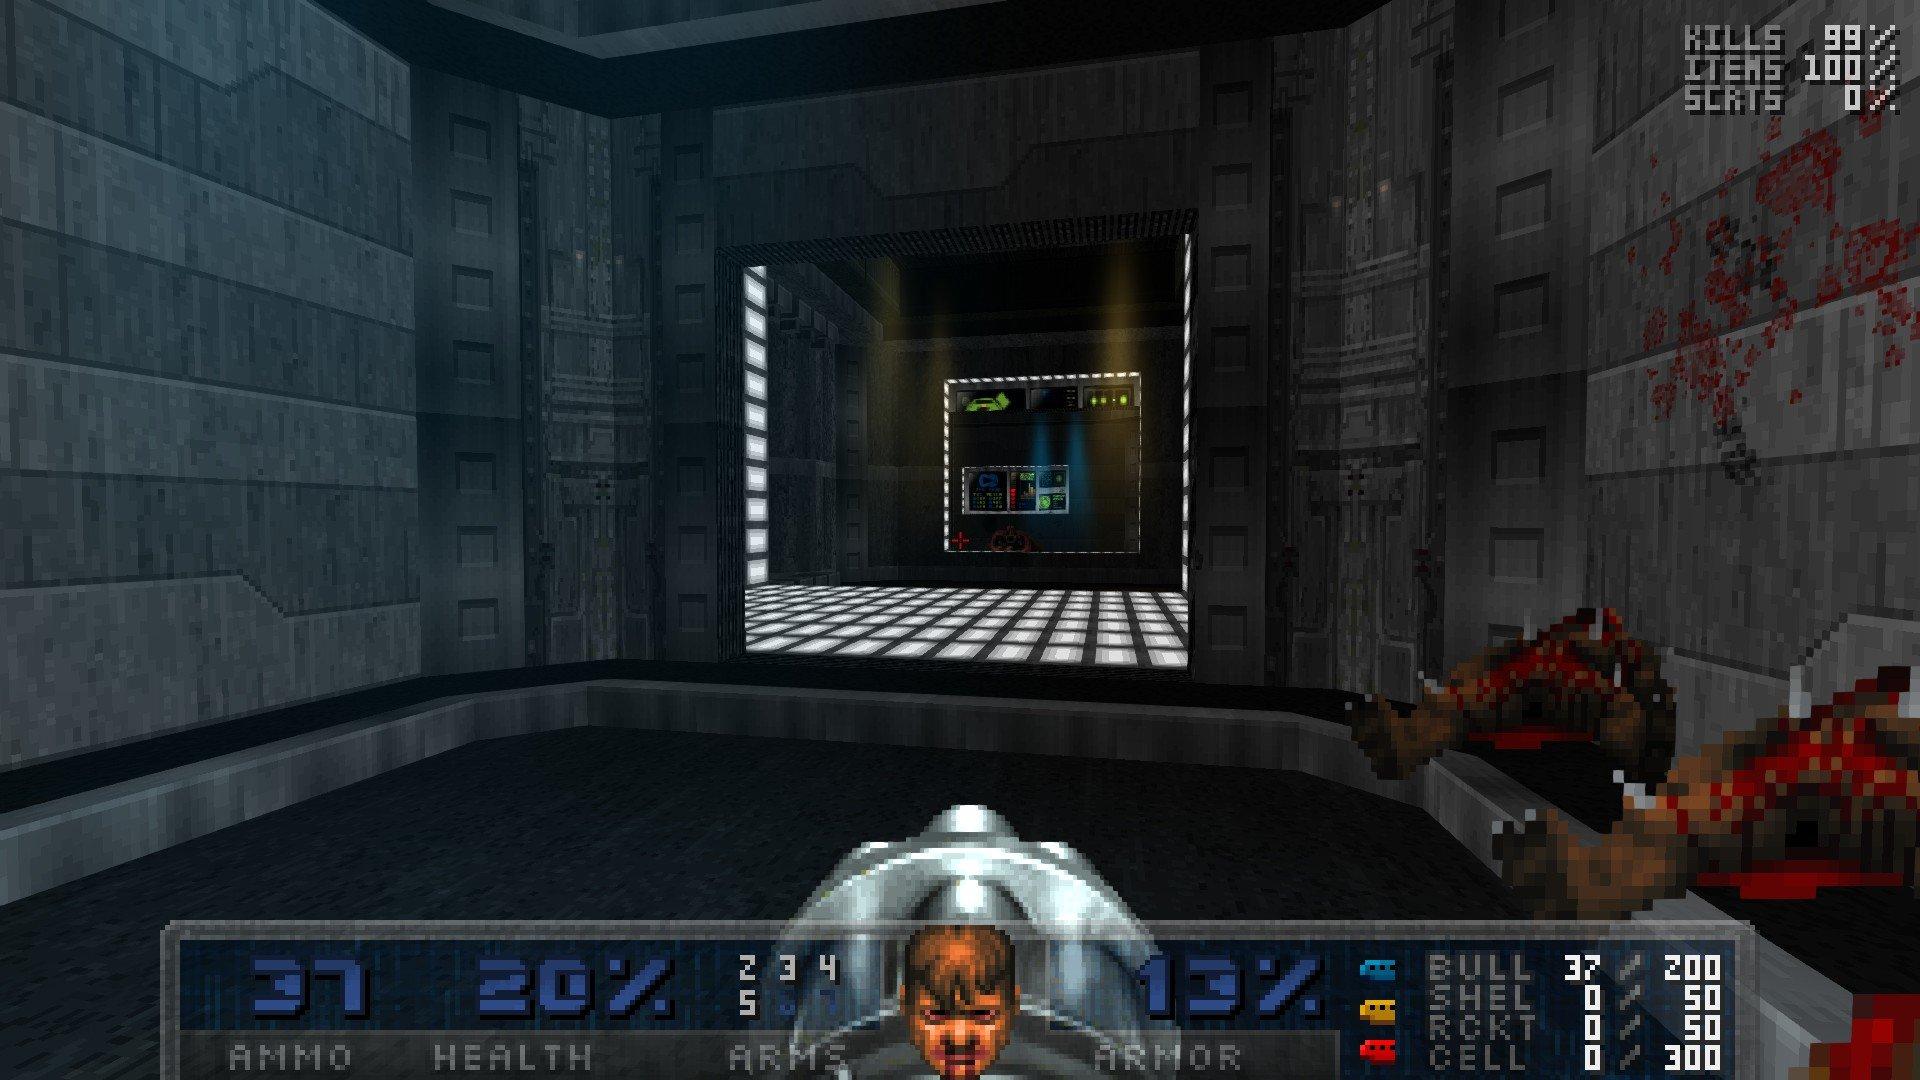 Screenshot_Doom_20200503_124530.jpg.9b7dff4da49b795a0bb60b51d7c6b534.jpg